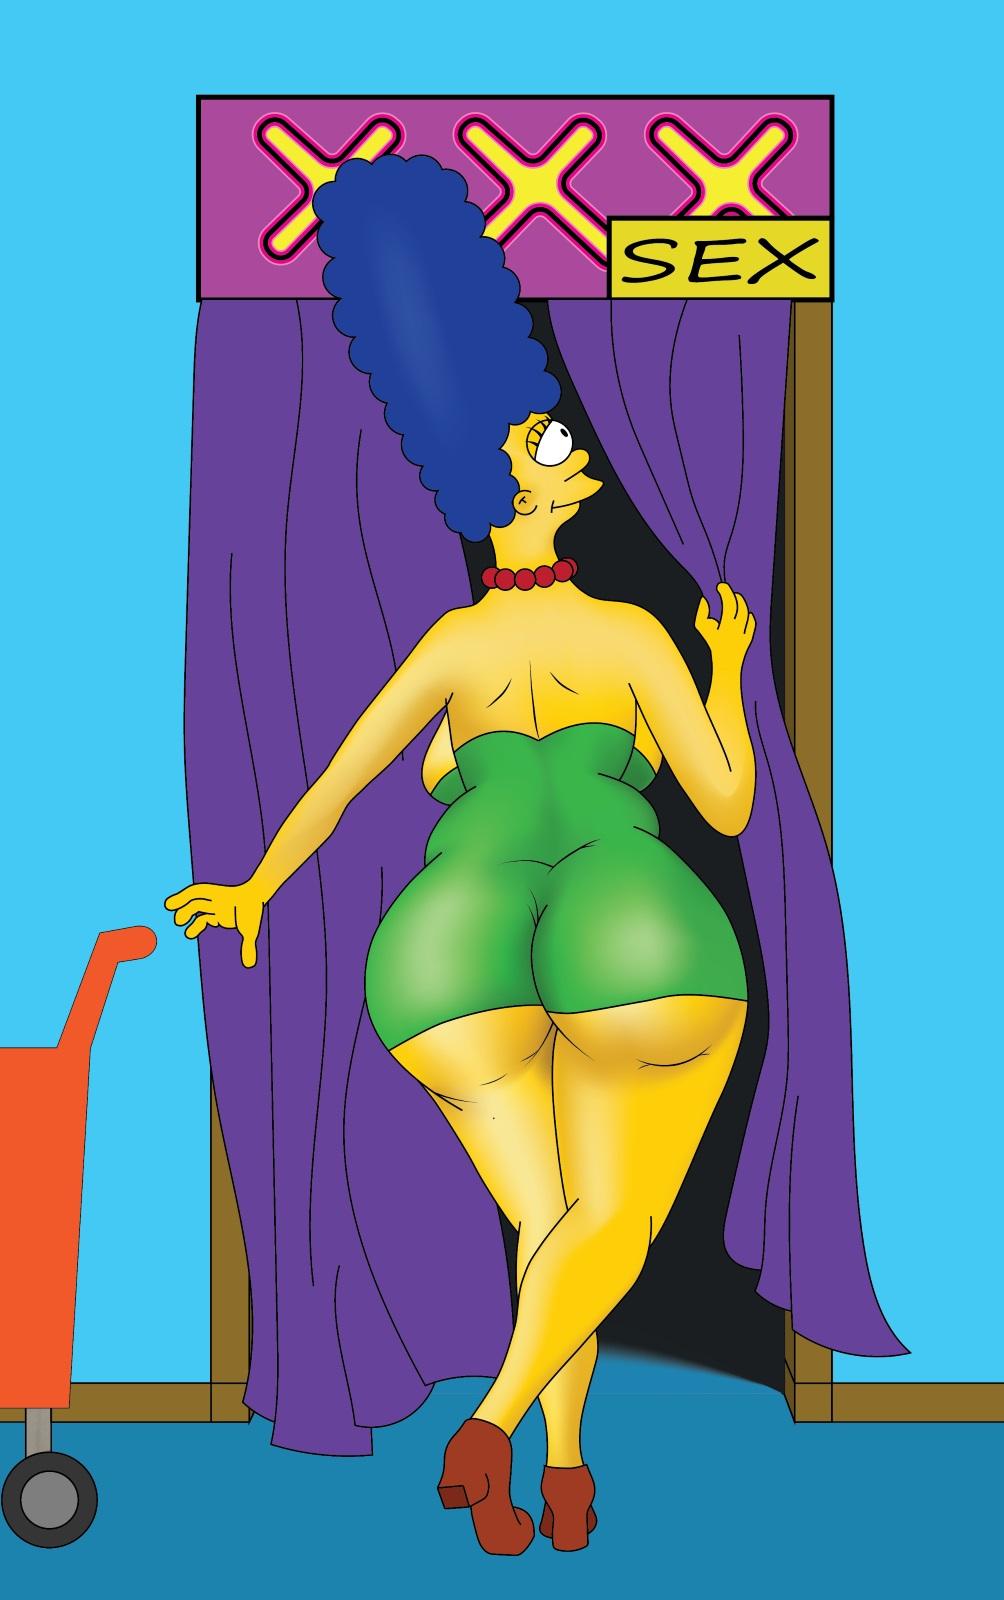 big_ass blue_hair butt_crack green_dress marge_simpson sideboob the_simpsons